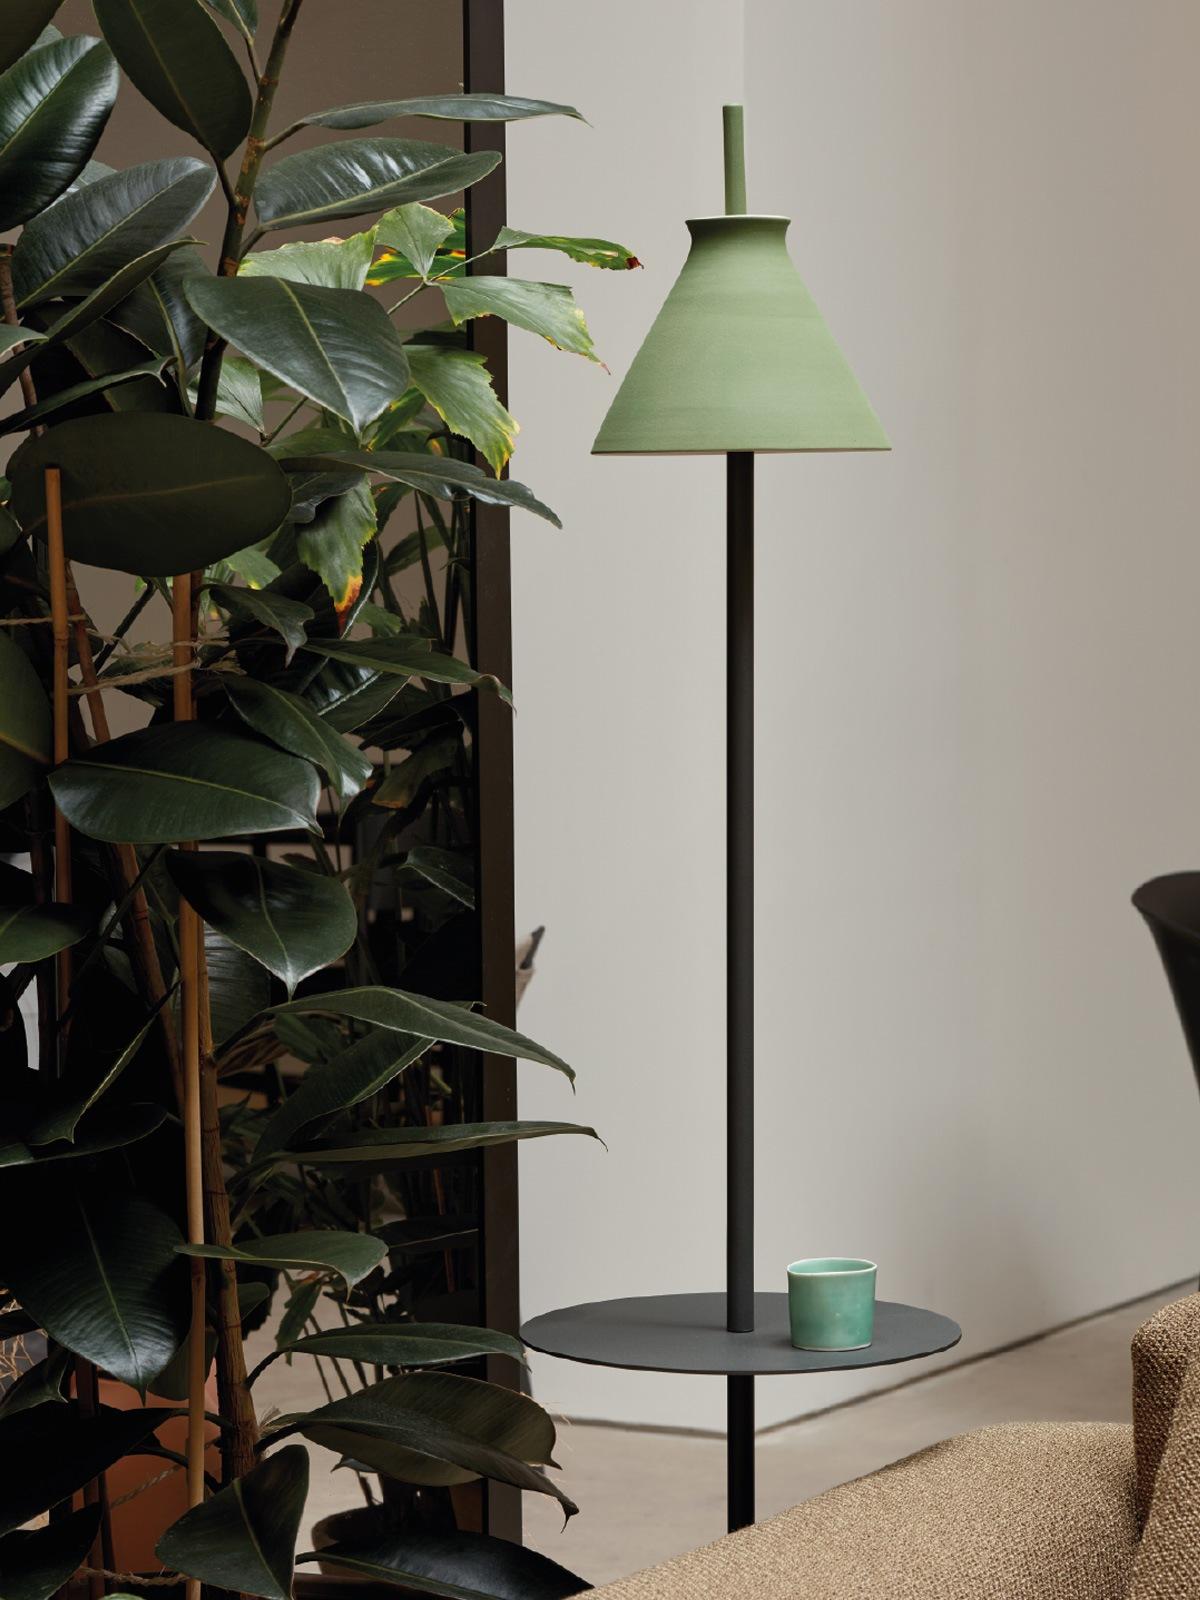 Totana 20 Keramikleuchte Pott Designort Berlin Lampen Onlineshop